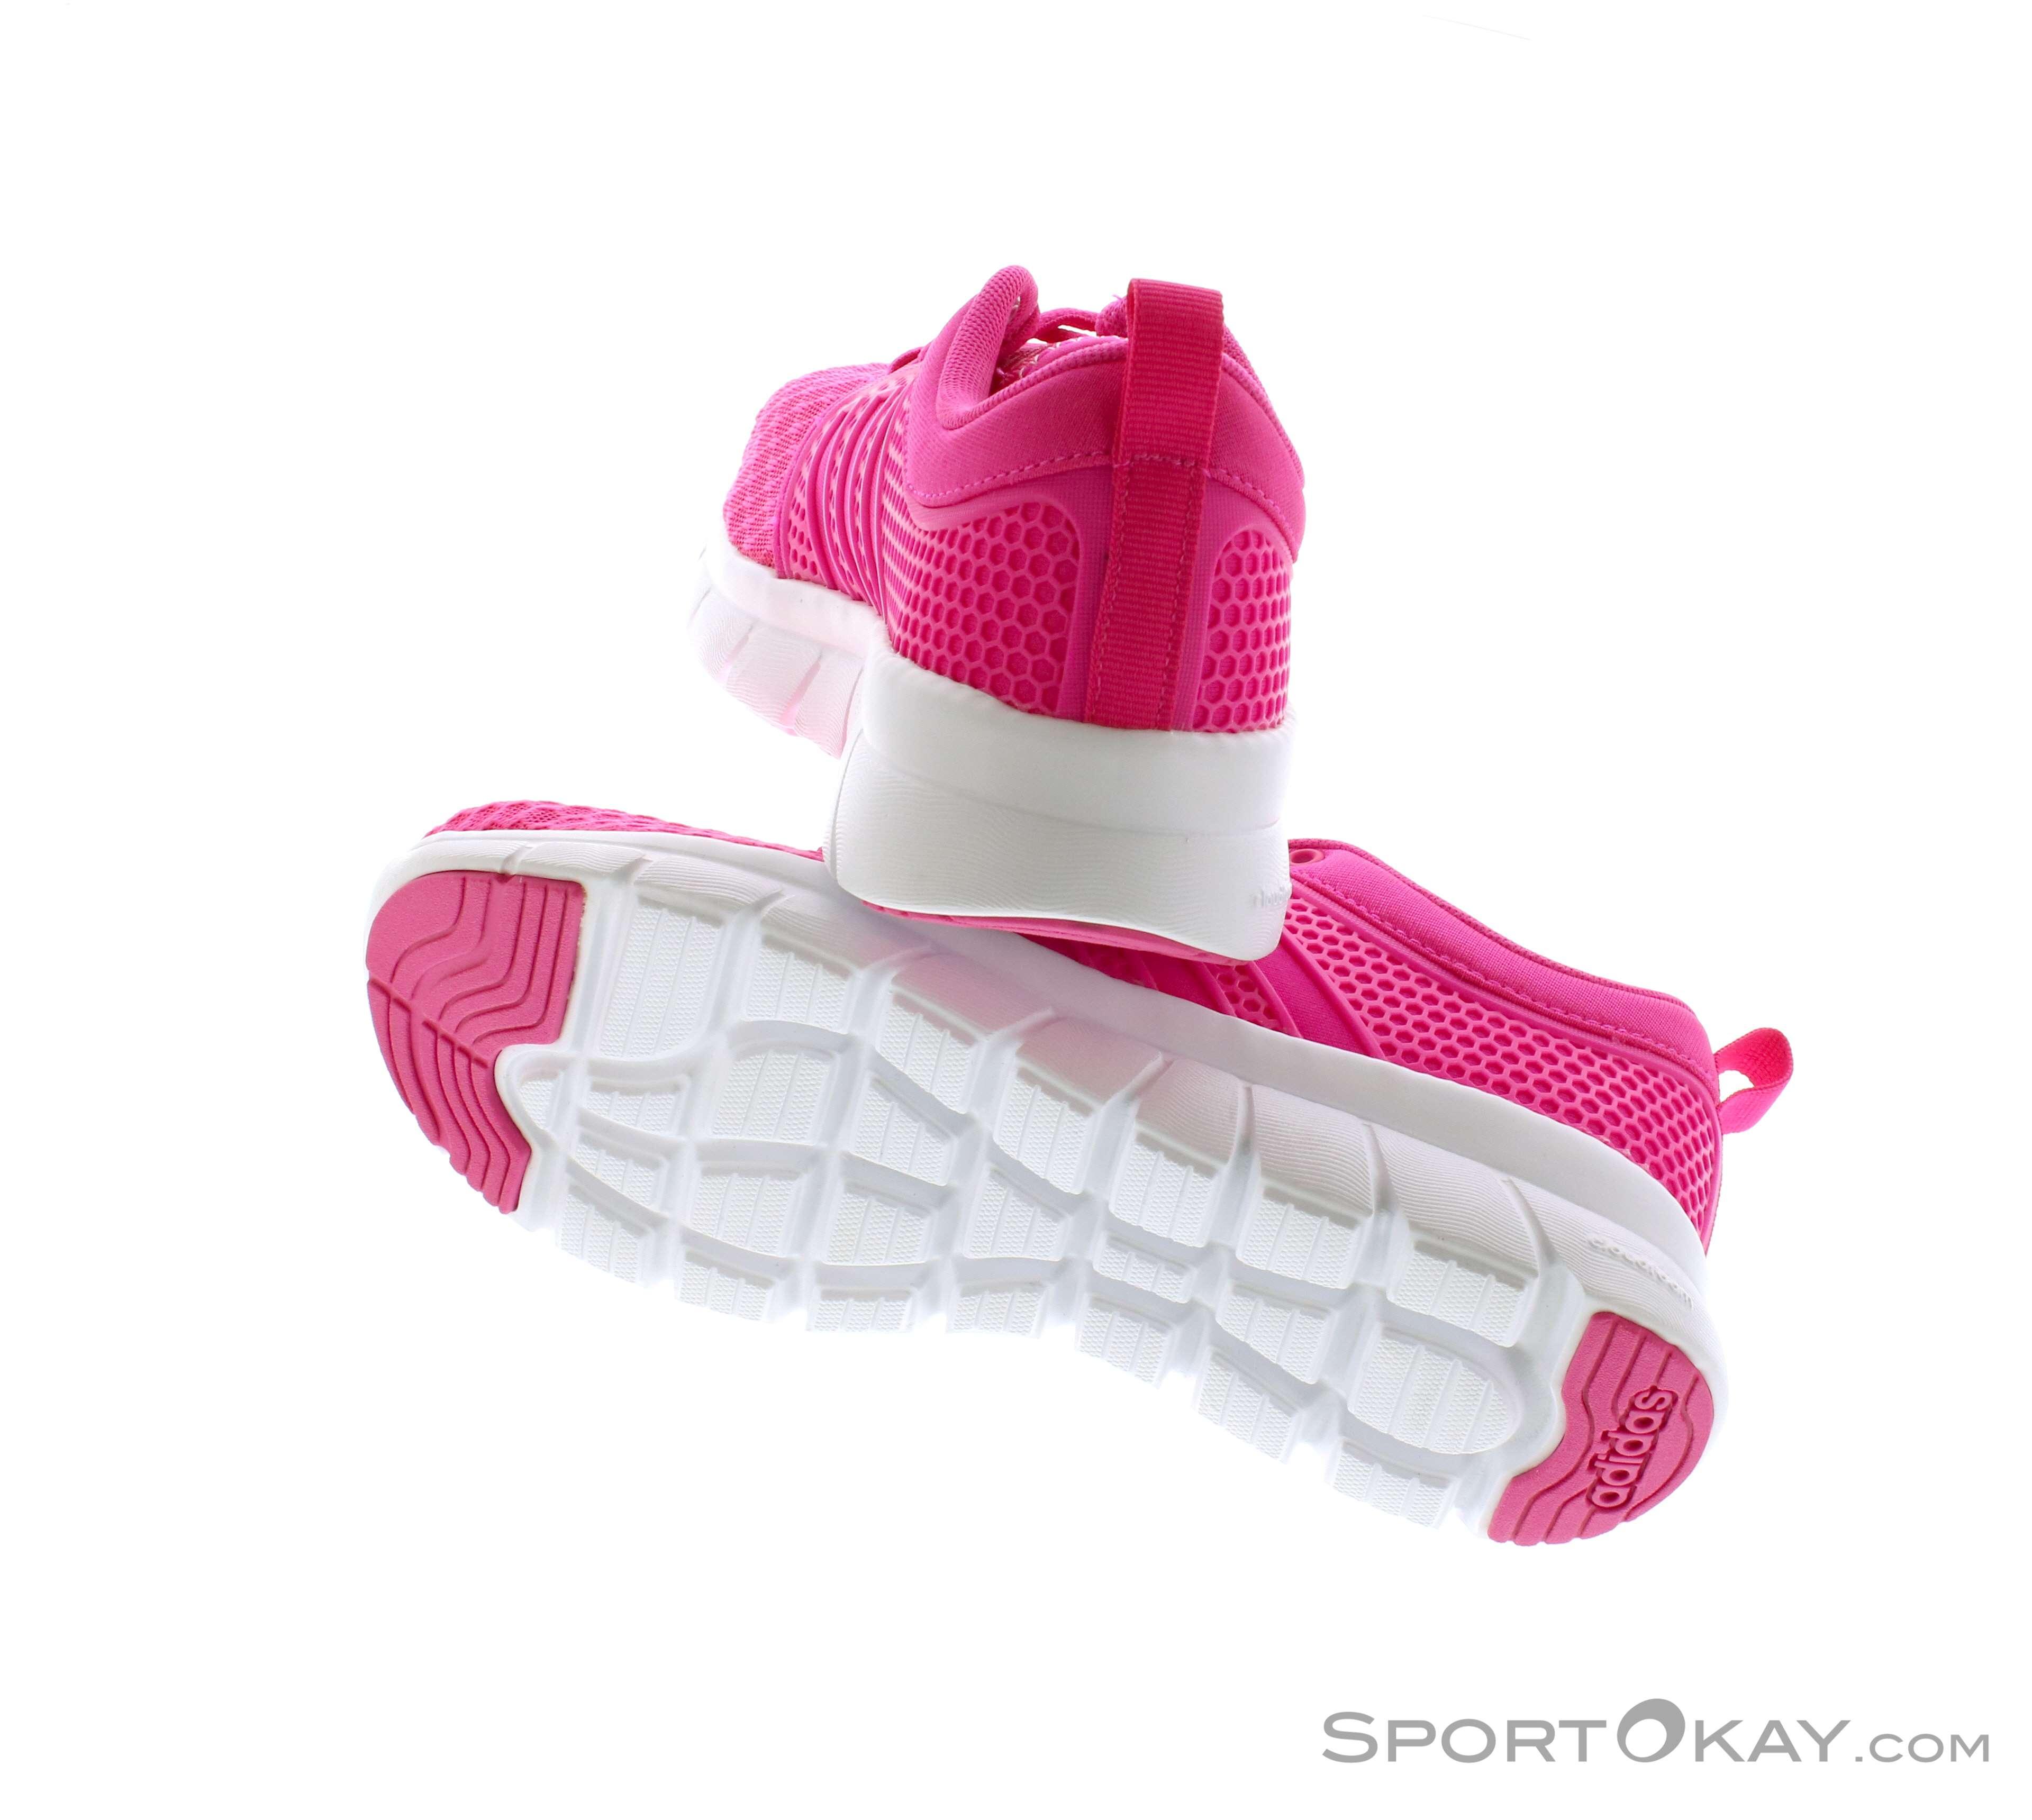 Adidas CLOUDFOAM GROOVE W Damen Sneaker Sportschuhe Neu Gr